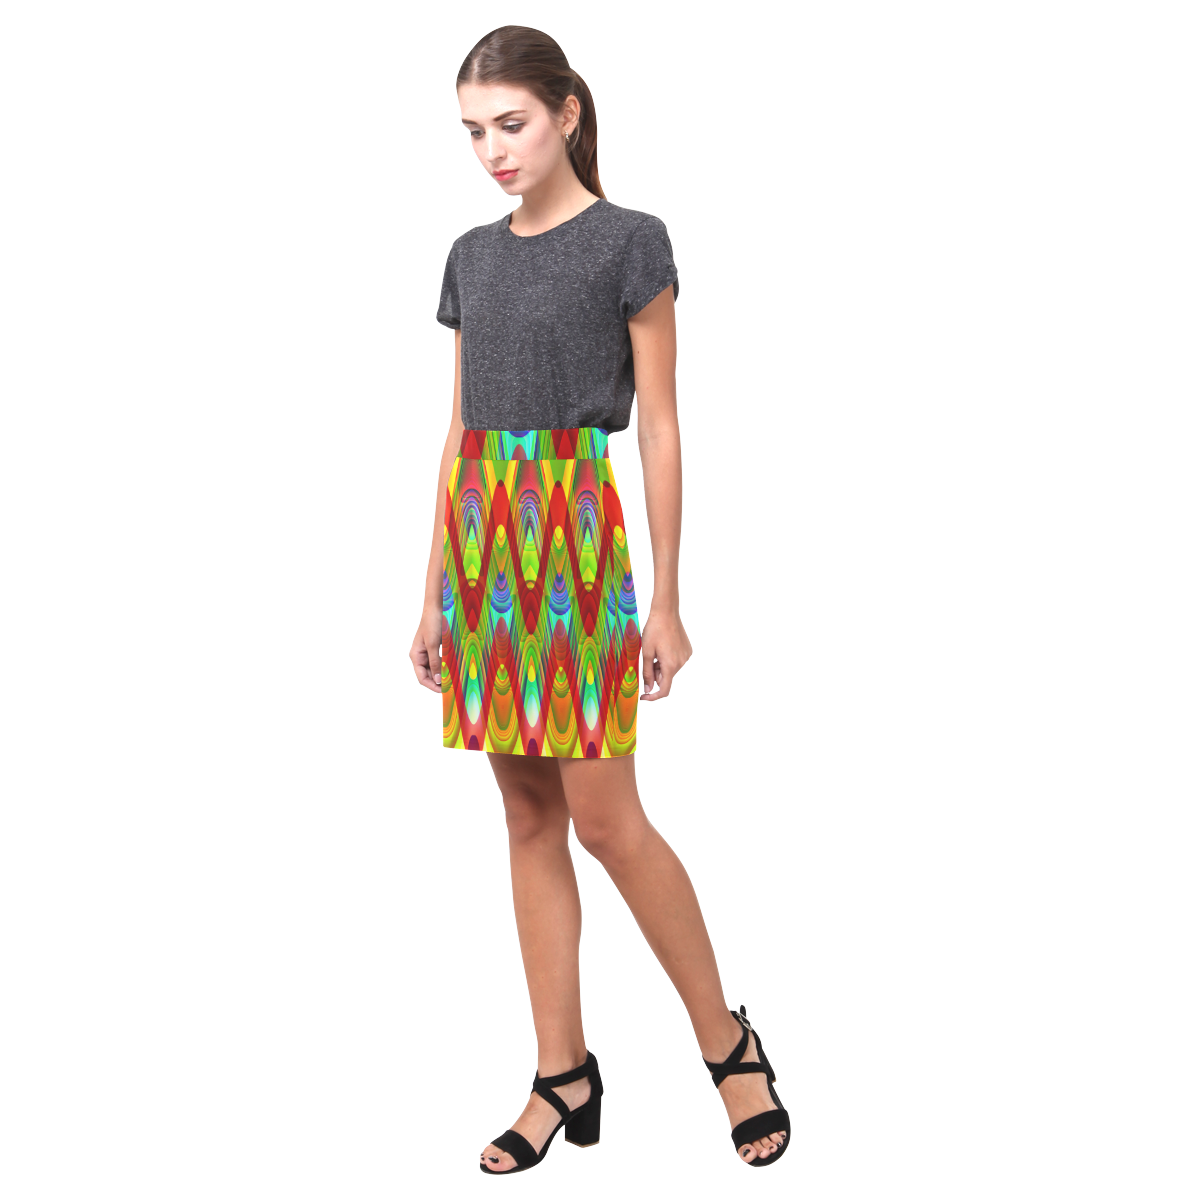 2D Wave #1A - Jera Nour Nemesis Skirt (Model D02)